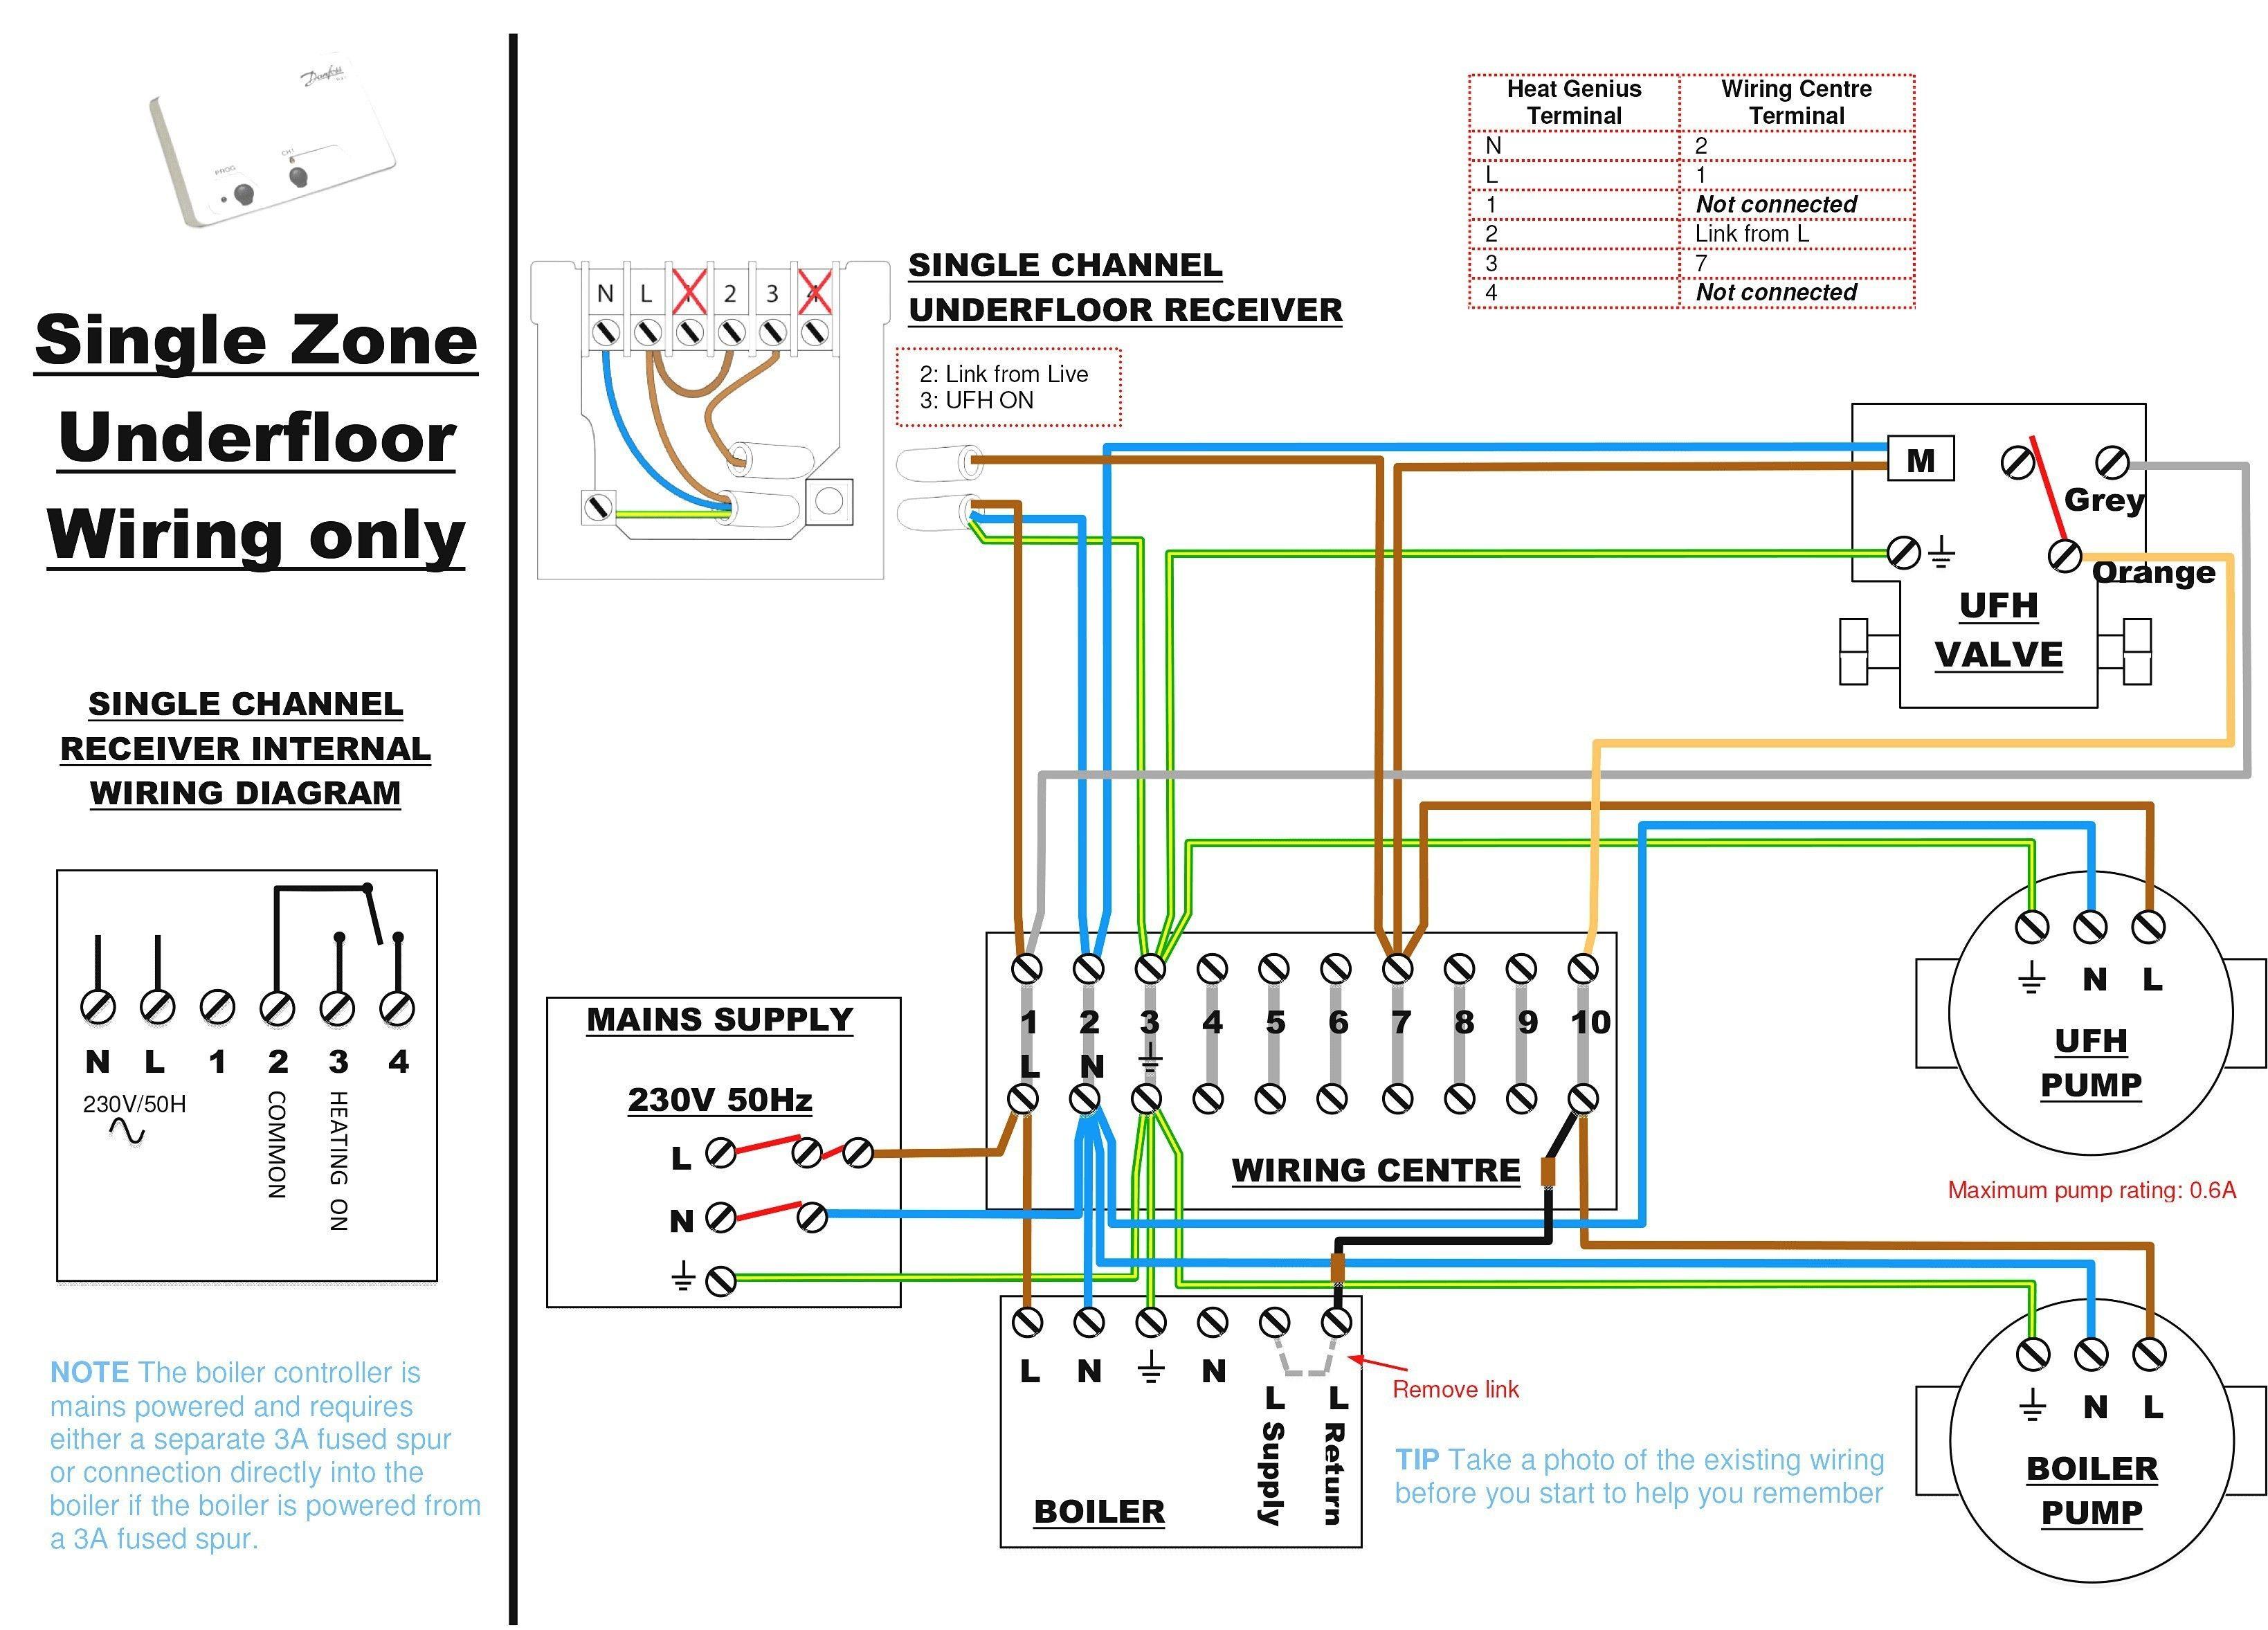 Lovely Y Plan Wiring Diagram Combi Boiler diagrams